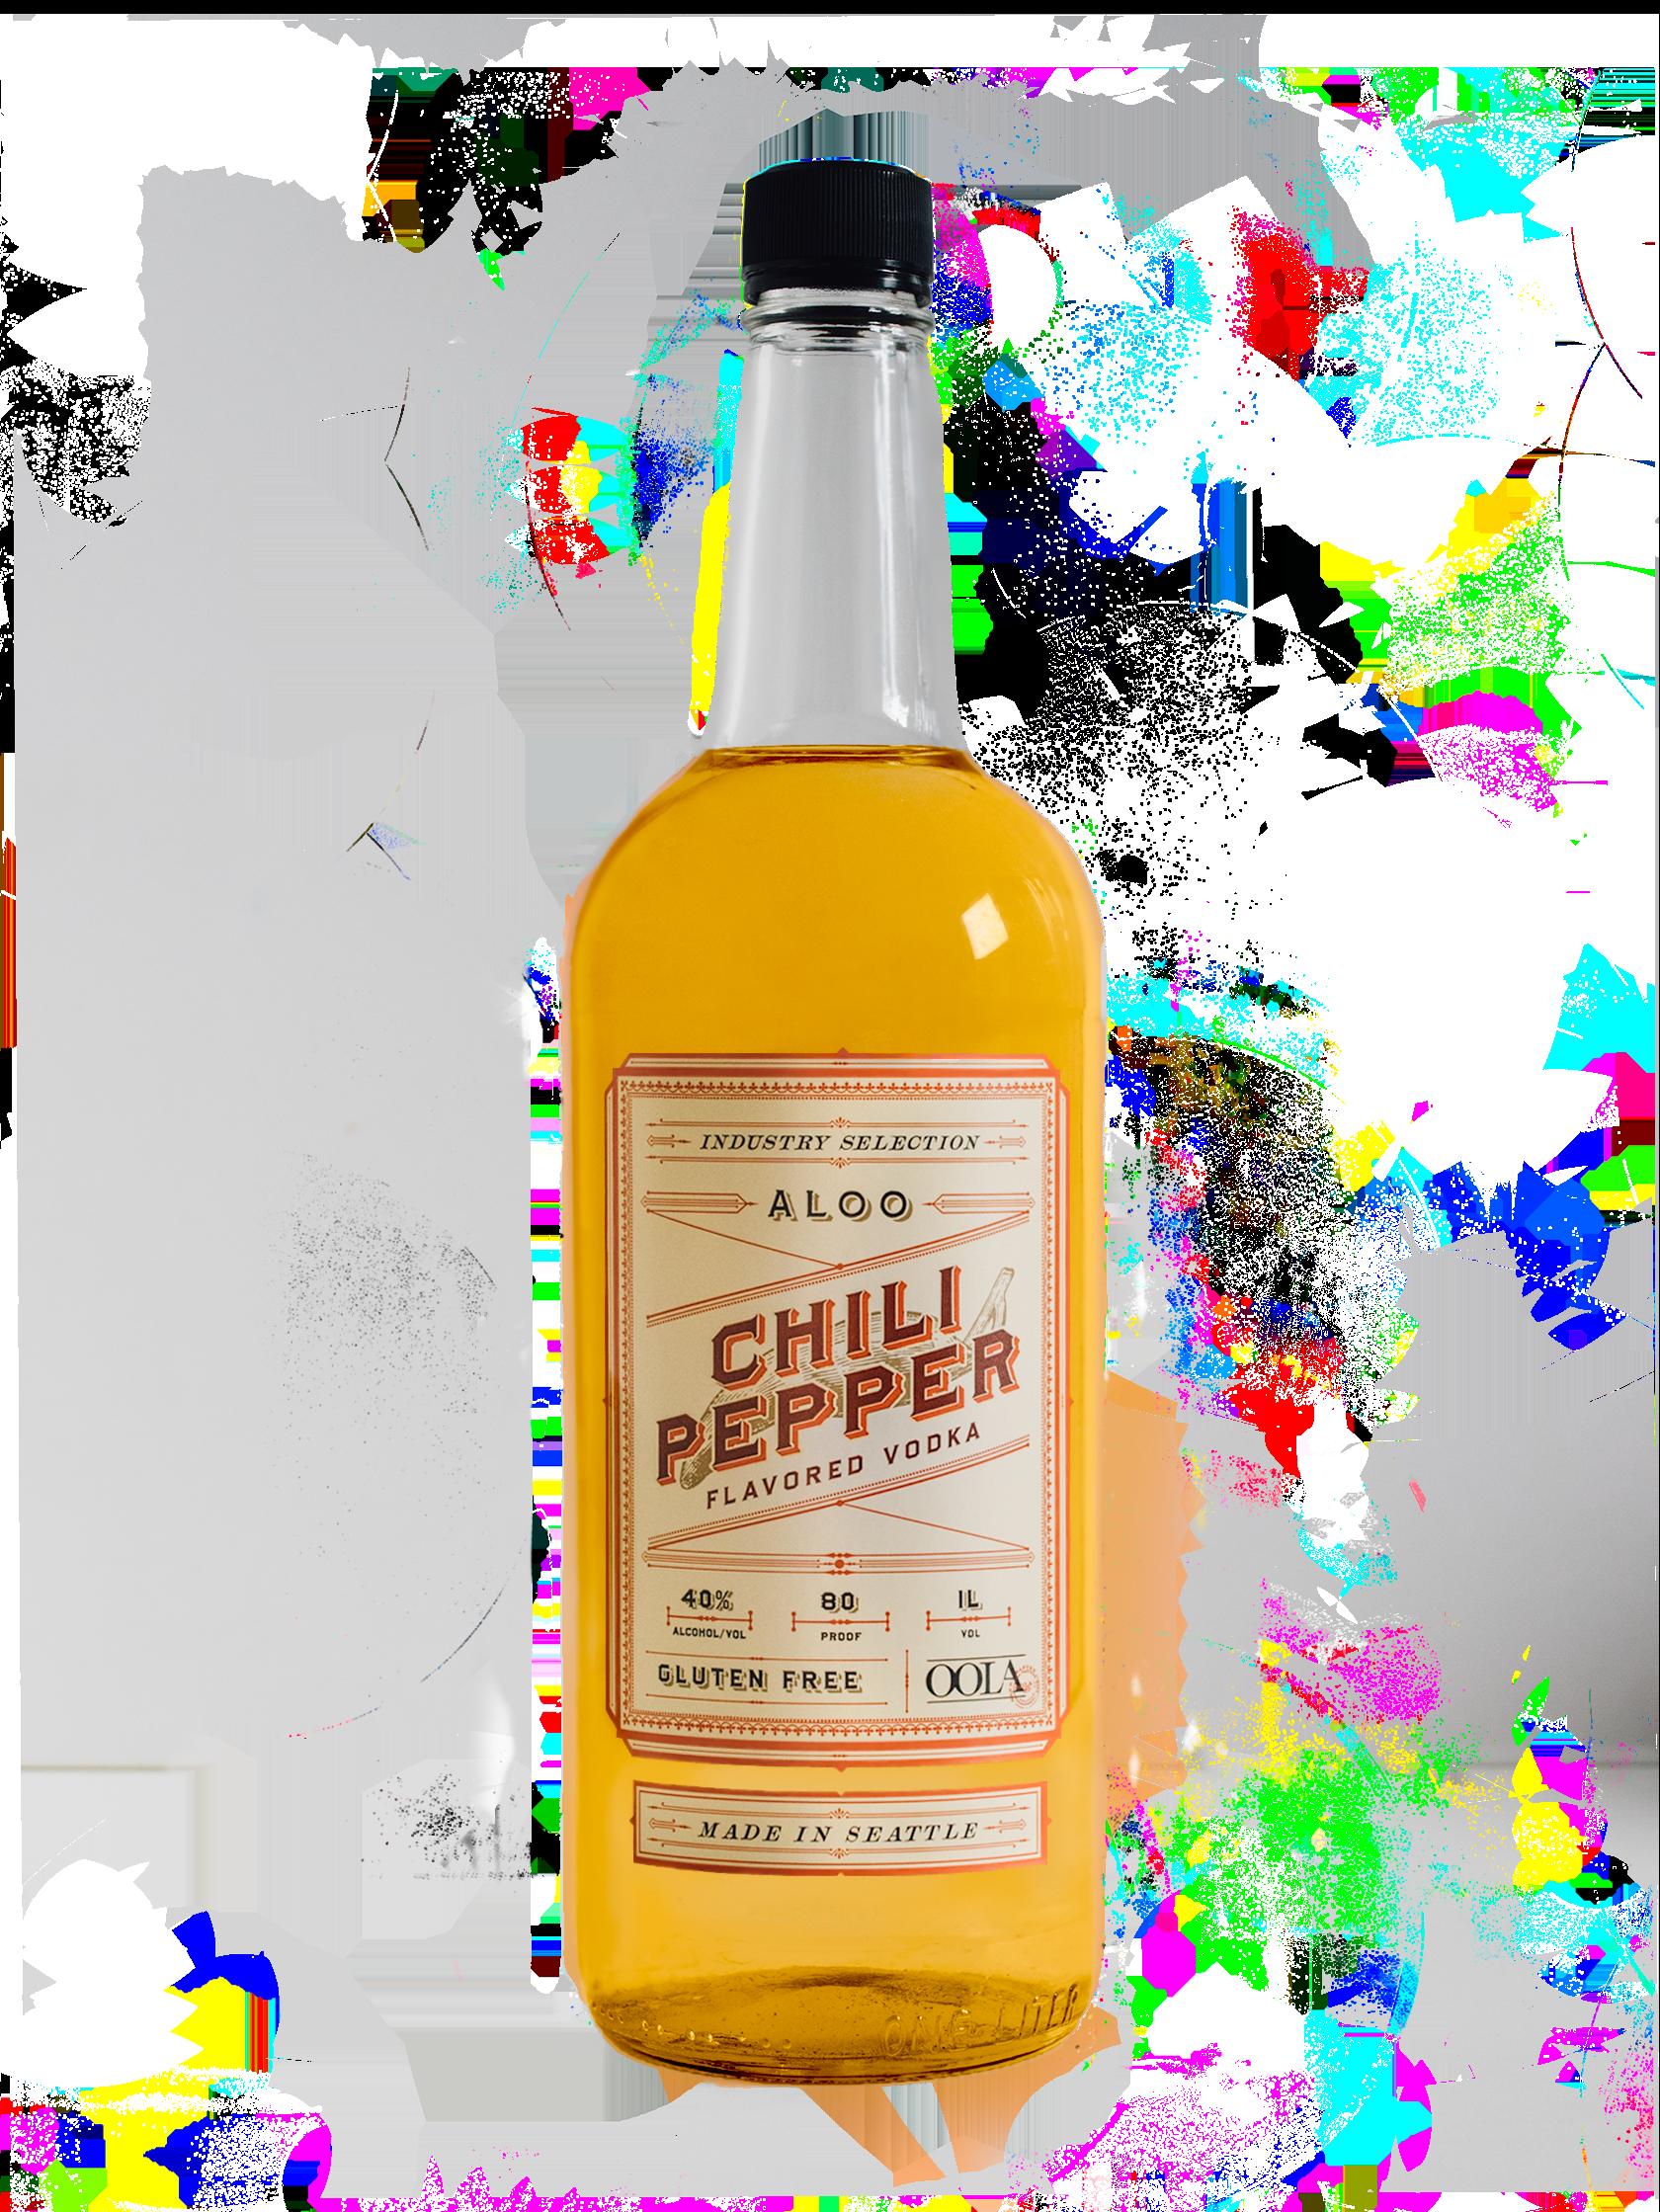 aloo_chili_pepper_vodka_bottle_shot_2018.png